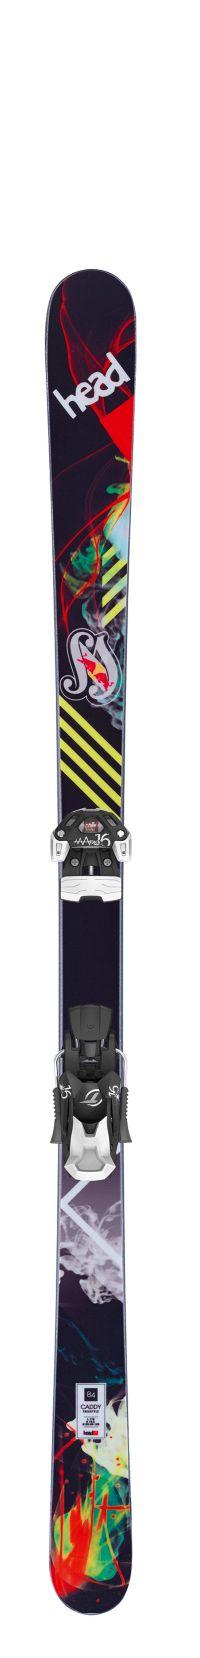 The Caddy Twintip Ski